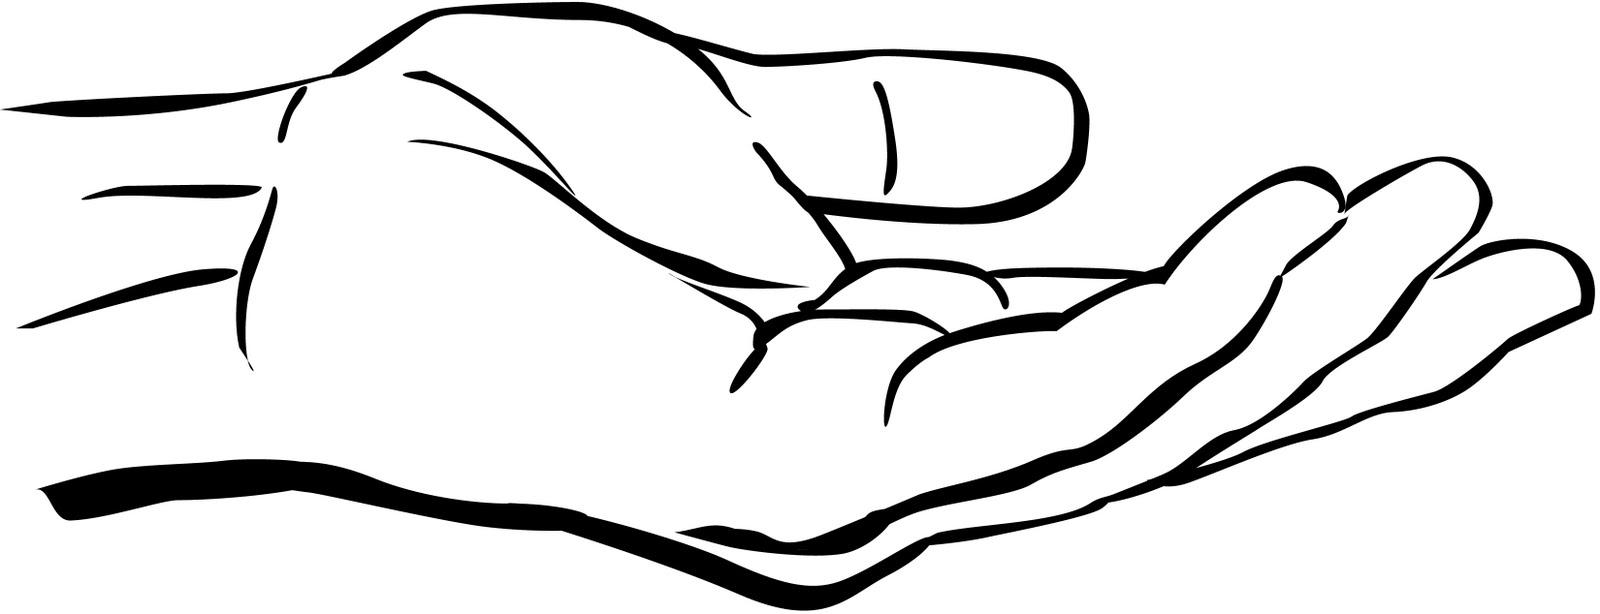 1600x614 Top 57 Hands Clip Art